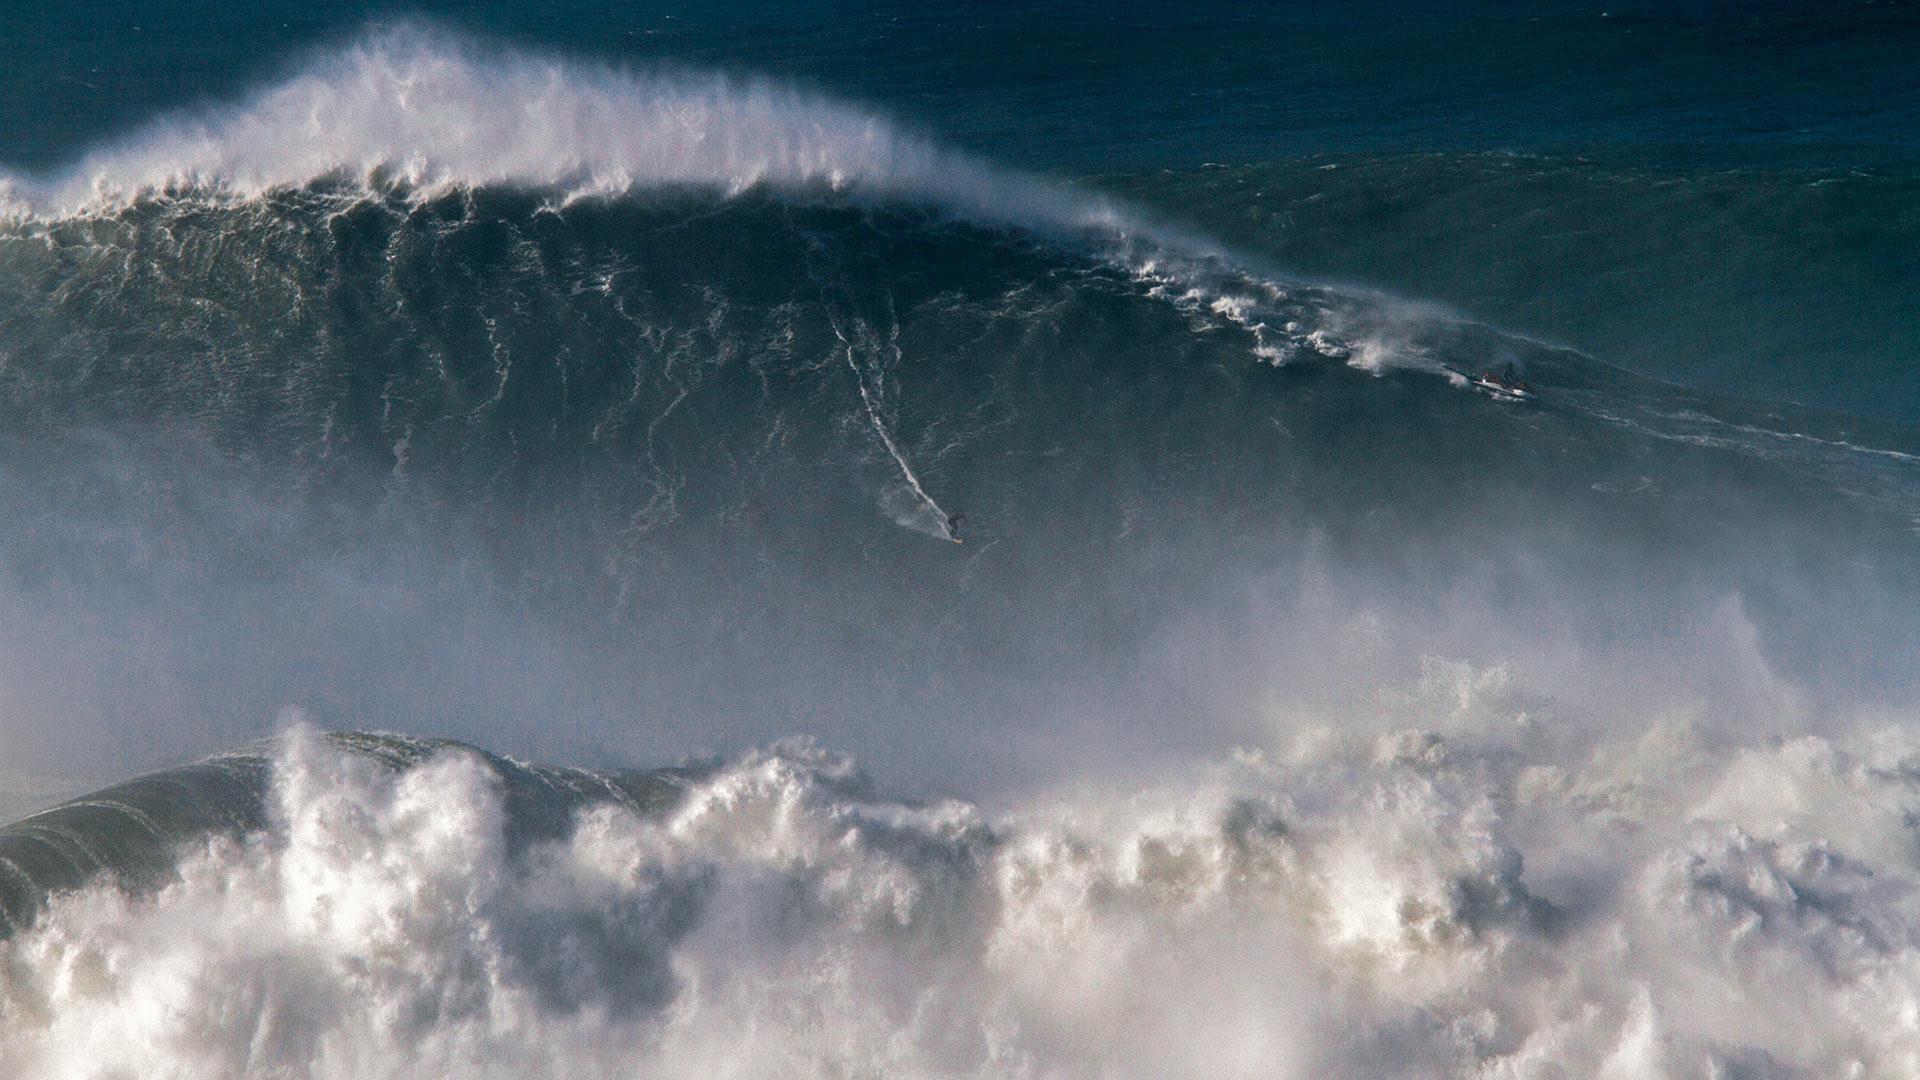 Rodrigo Koxa riding the biggest wave ever surfed, on Nov 8, 2017, off the coast of Nazaré, Portugal (© Pedro Cruz/AP Photo)(Bing United States)